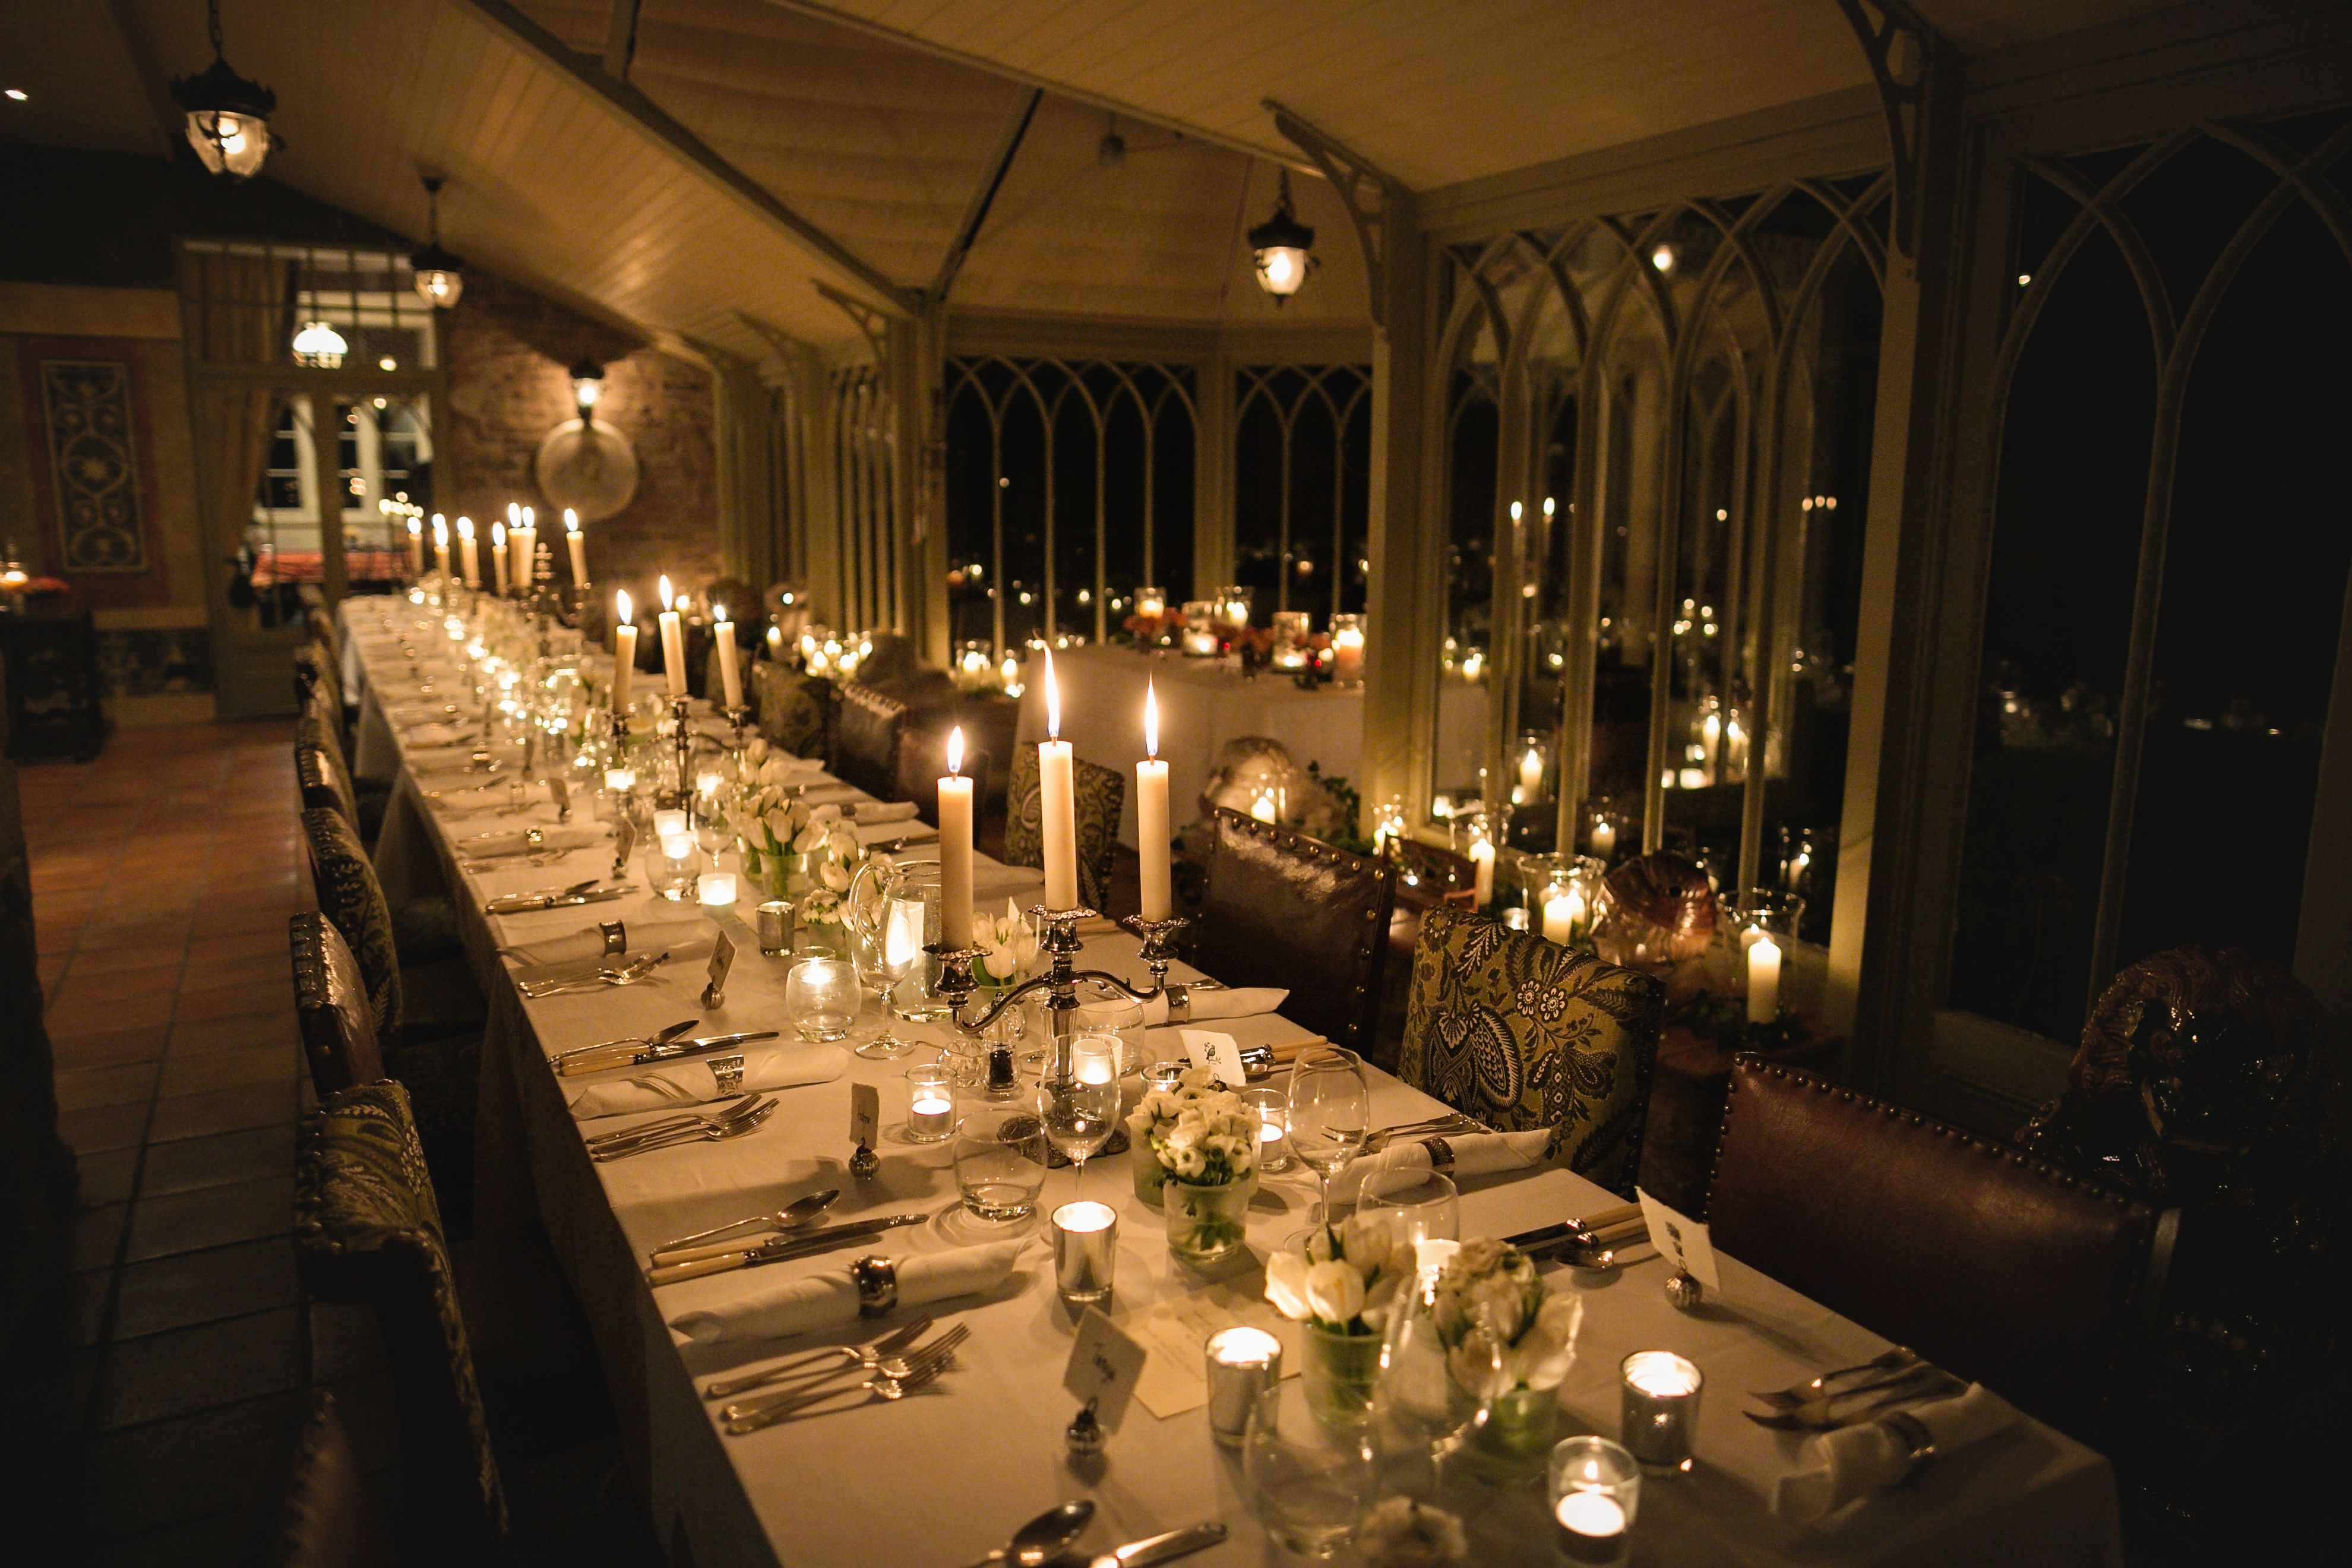 Enjoy A Candlelit Wedding Reception Inside The Spectacular